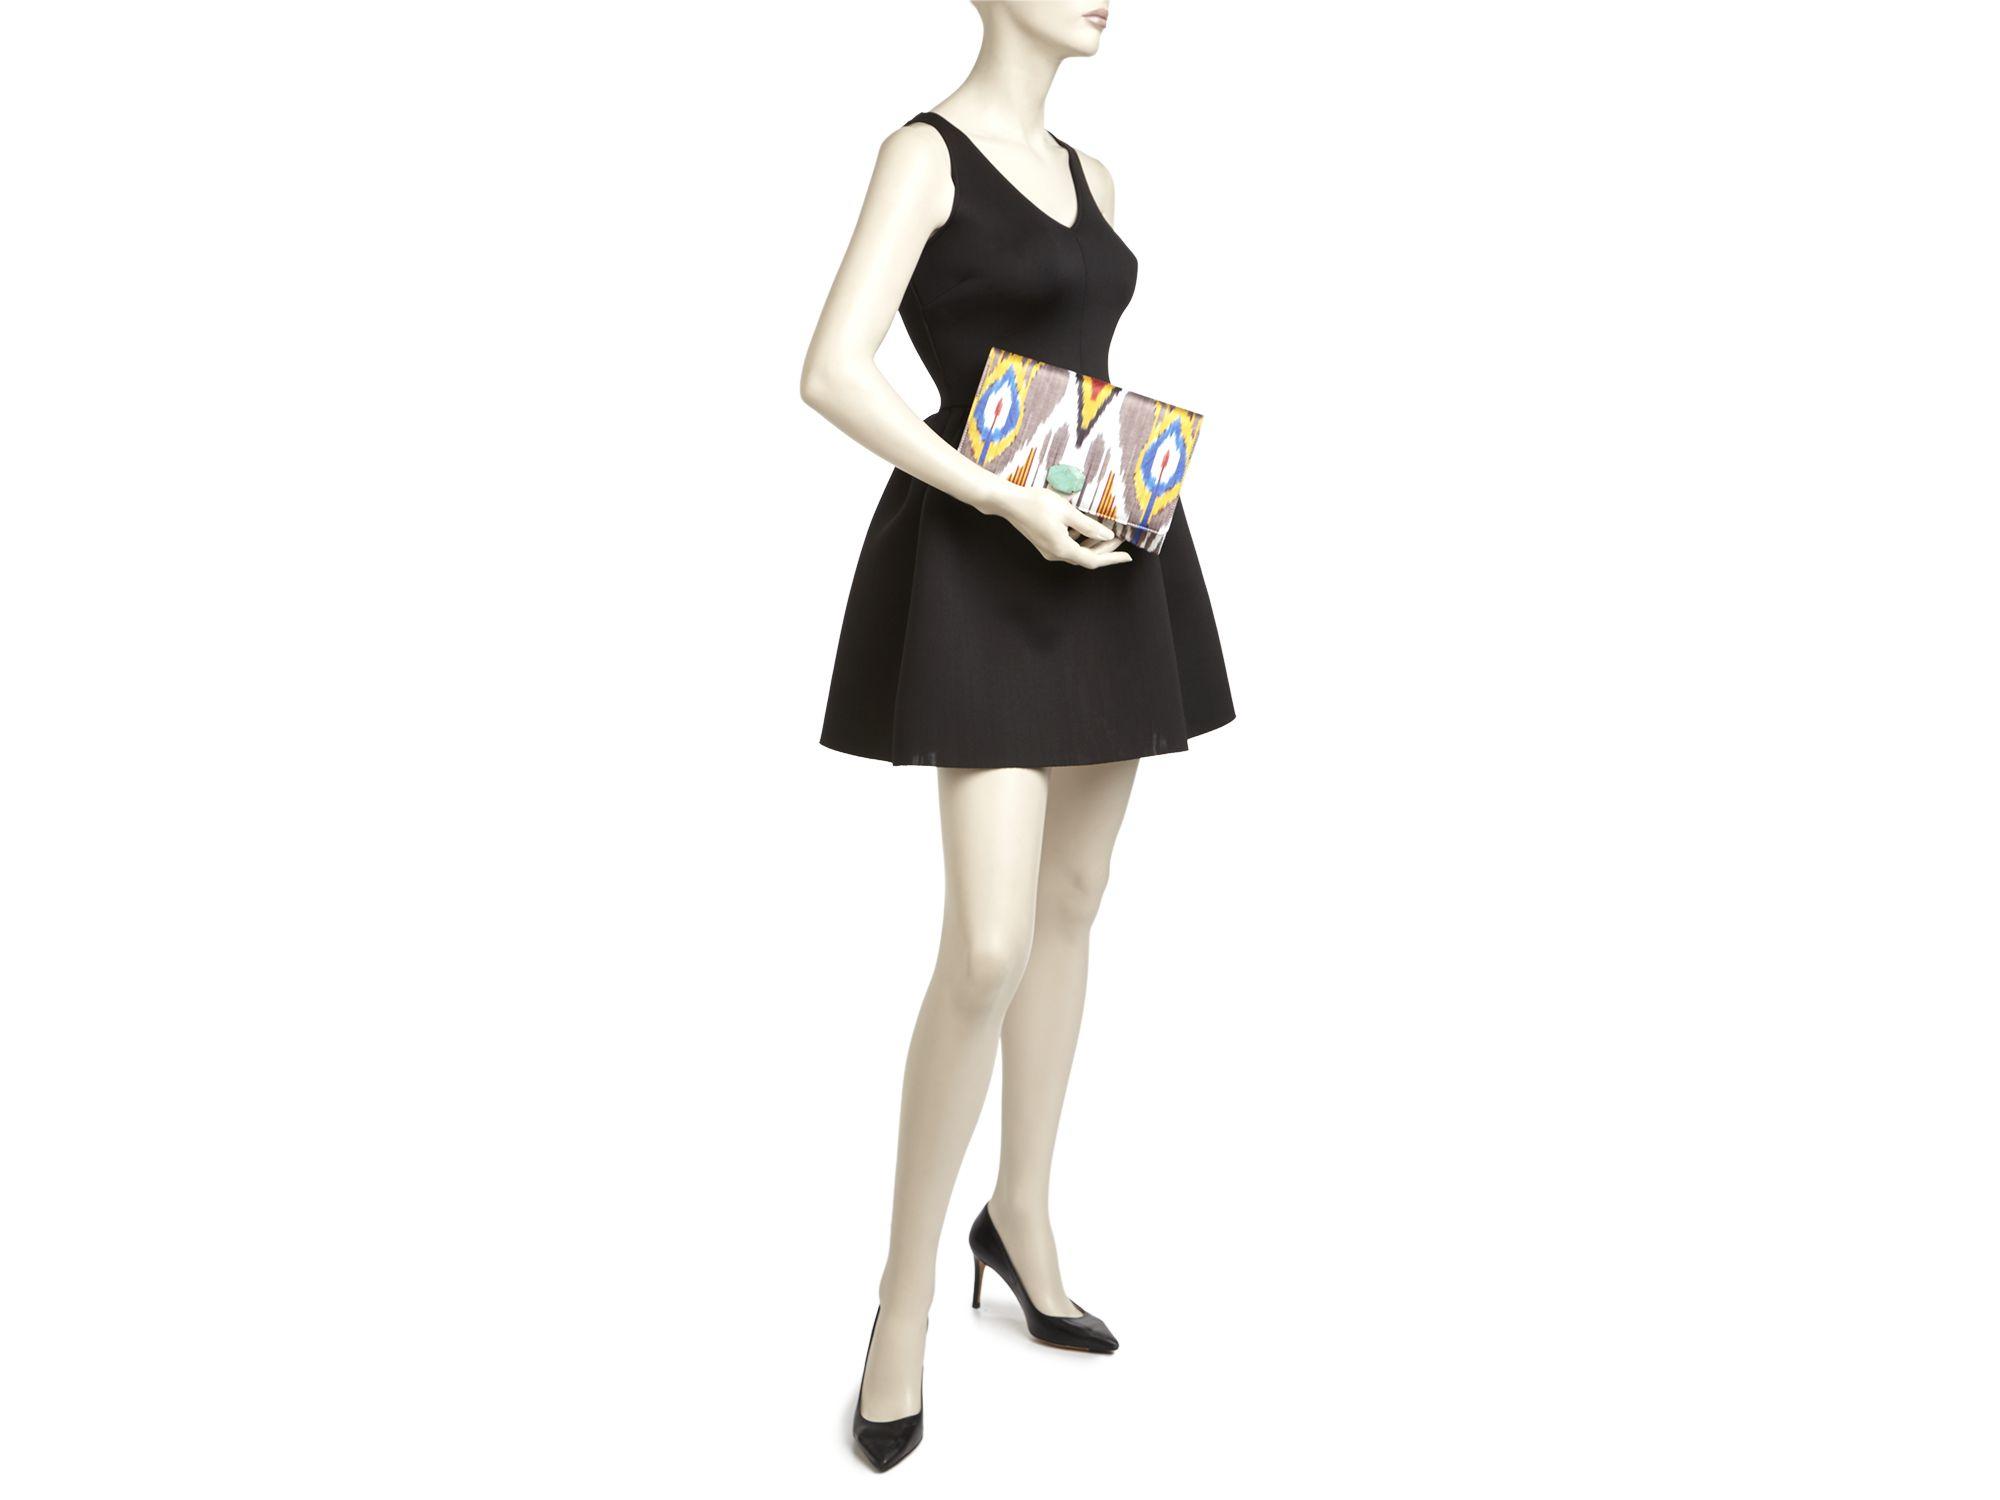 chloie bags - chloe stone-embellished pochette, discount chloe bags